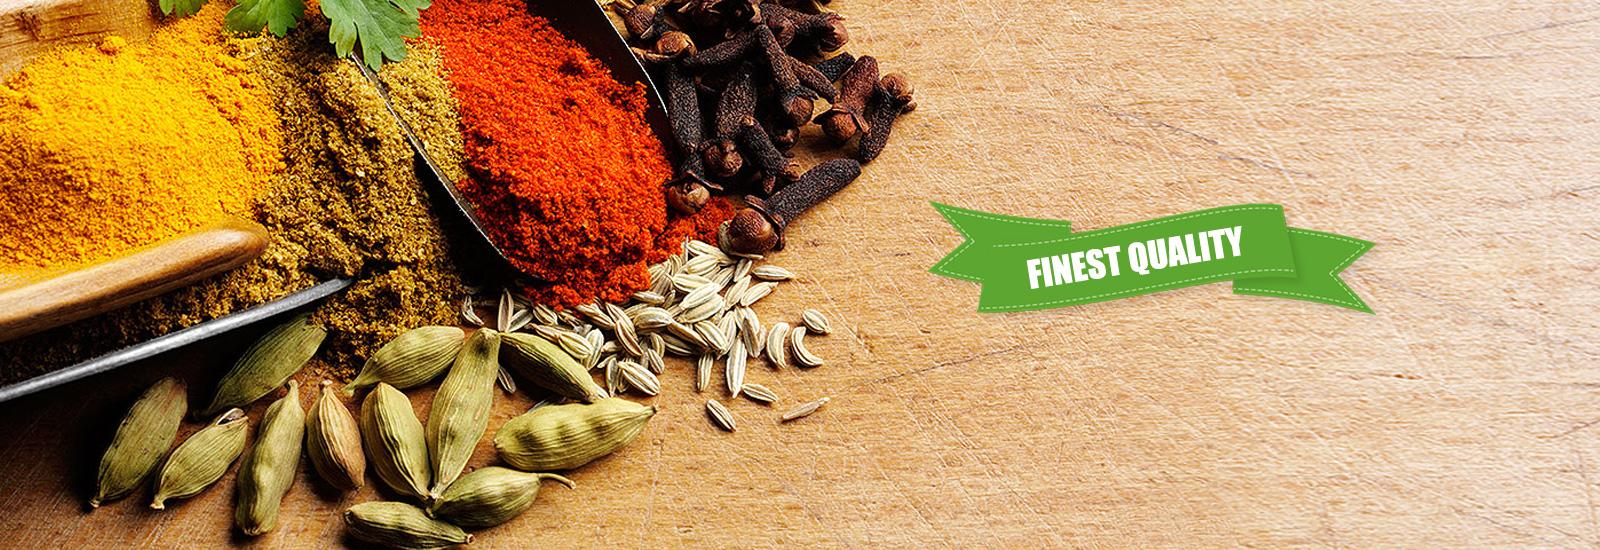 Al Souq Spices Packaging LLC